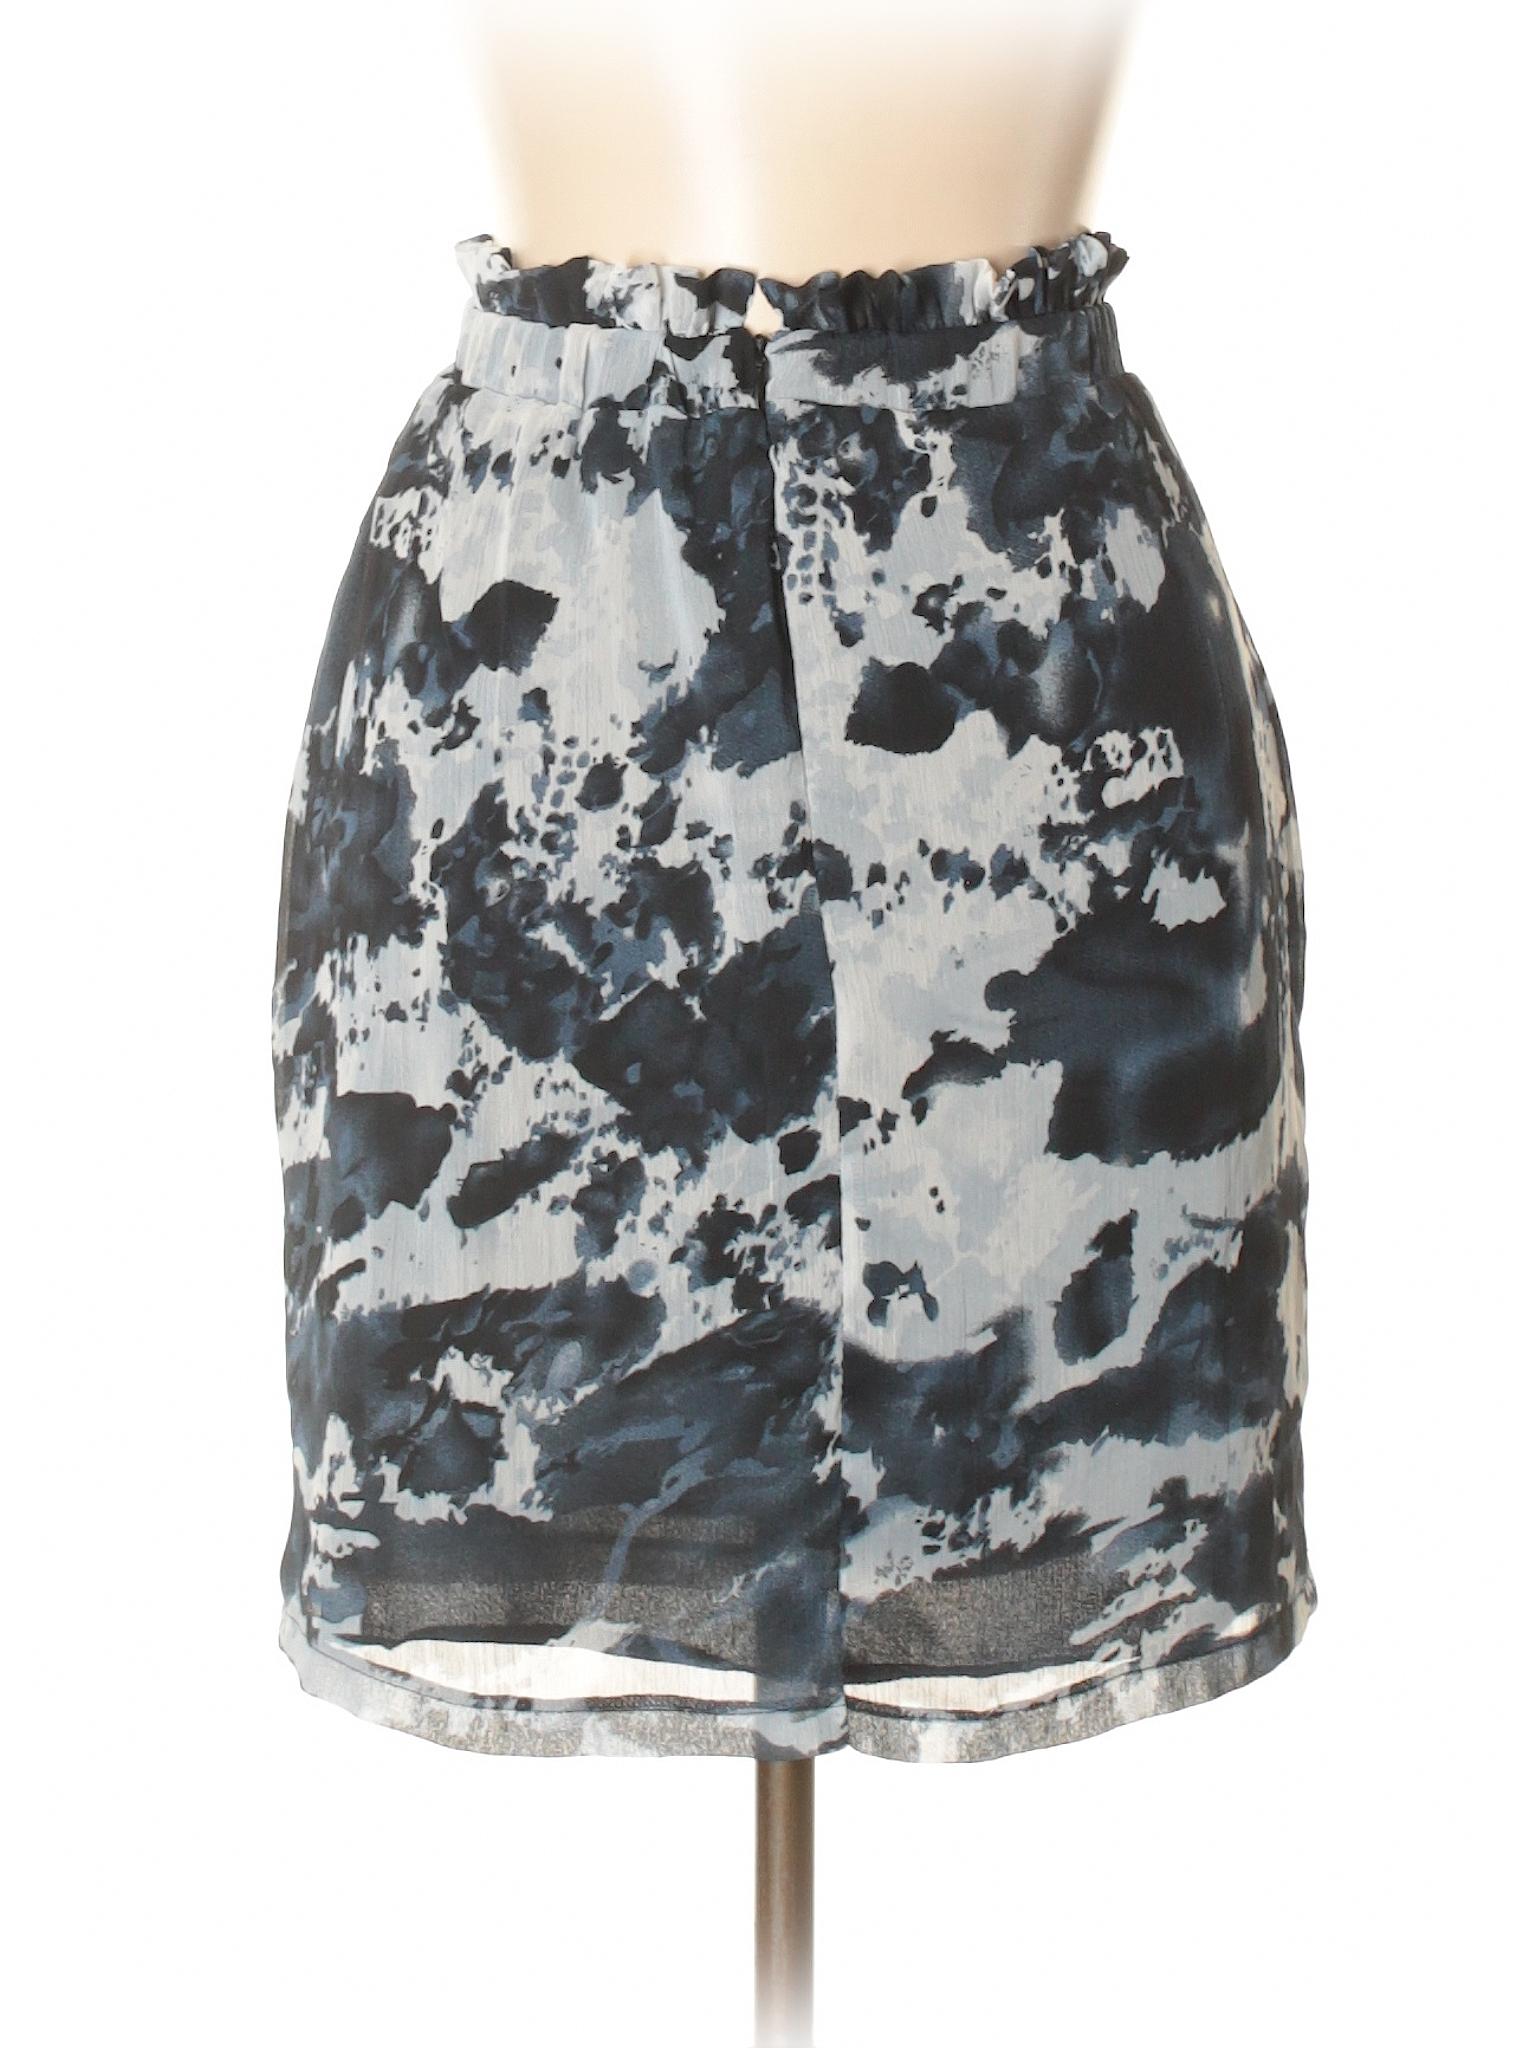 Hanna Casual winter Gracie Leisure Skirt amp; B5SUqxwY